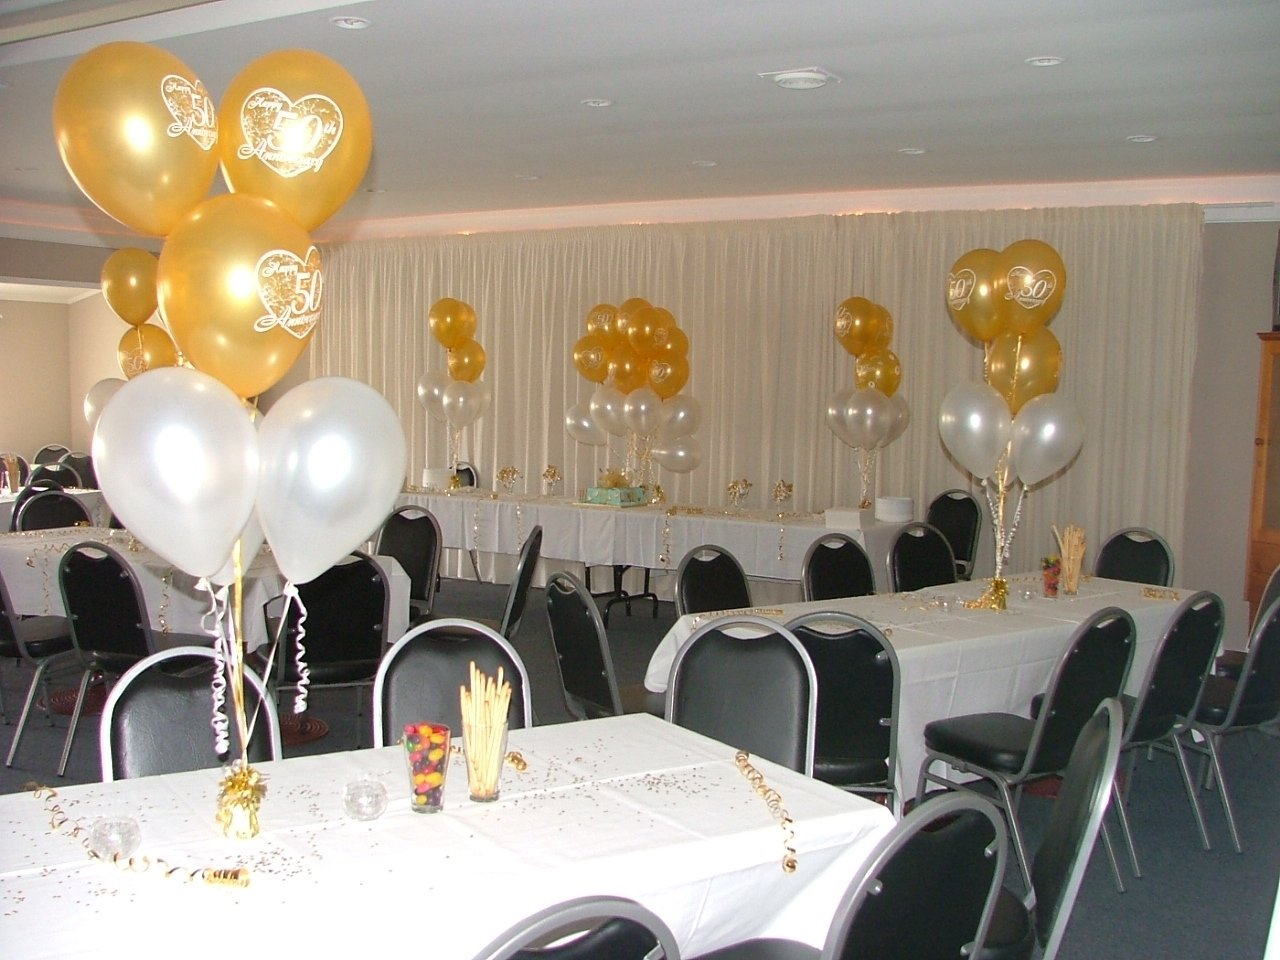 10 Best 50 Year Anniversary Party Ideas 50th wedding anniversary decorating ideas wedding decorations 1 2021